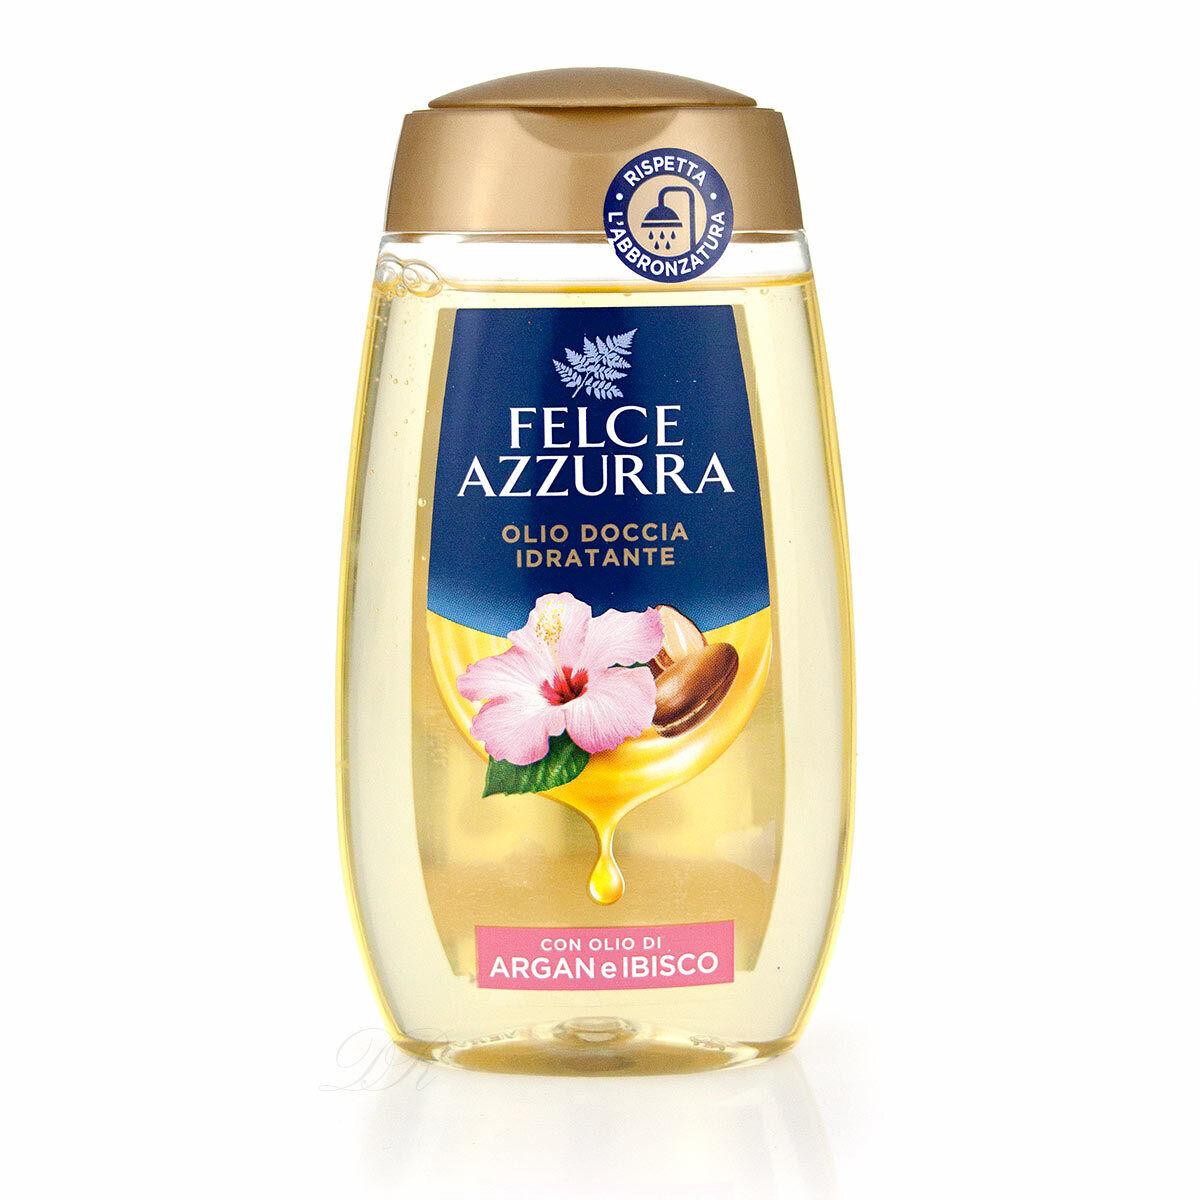 Paglieri Felce Azzurra Duschöl Idratante Argan & Hibiskus 250 ml